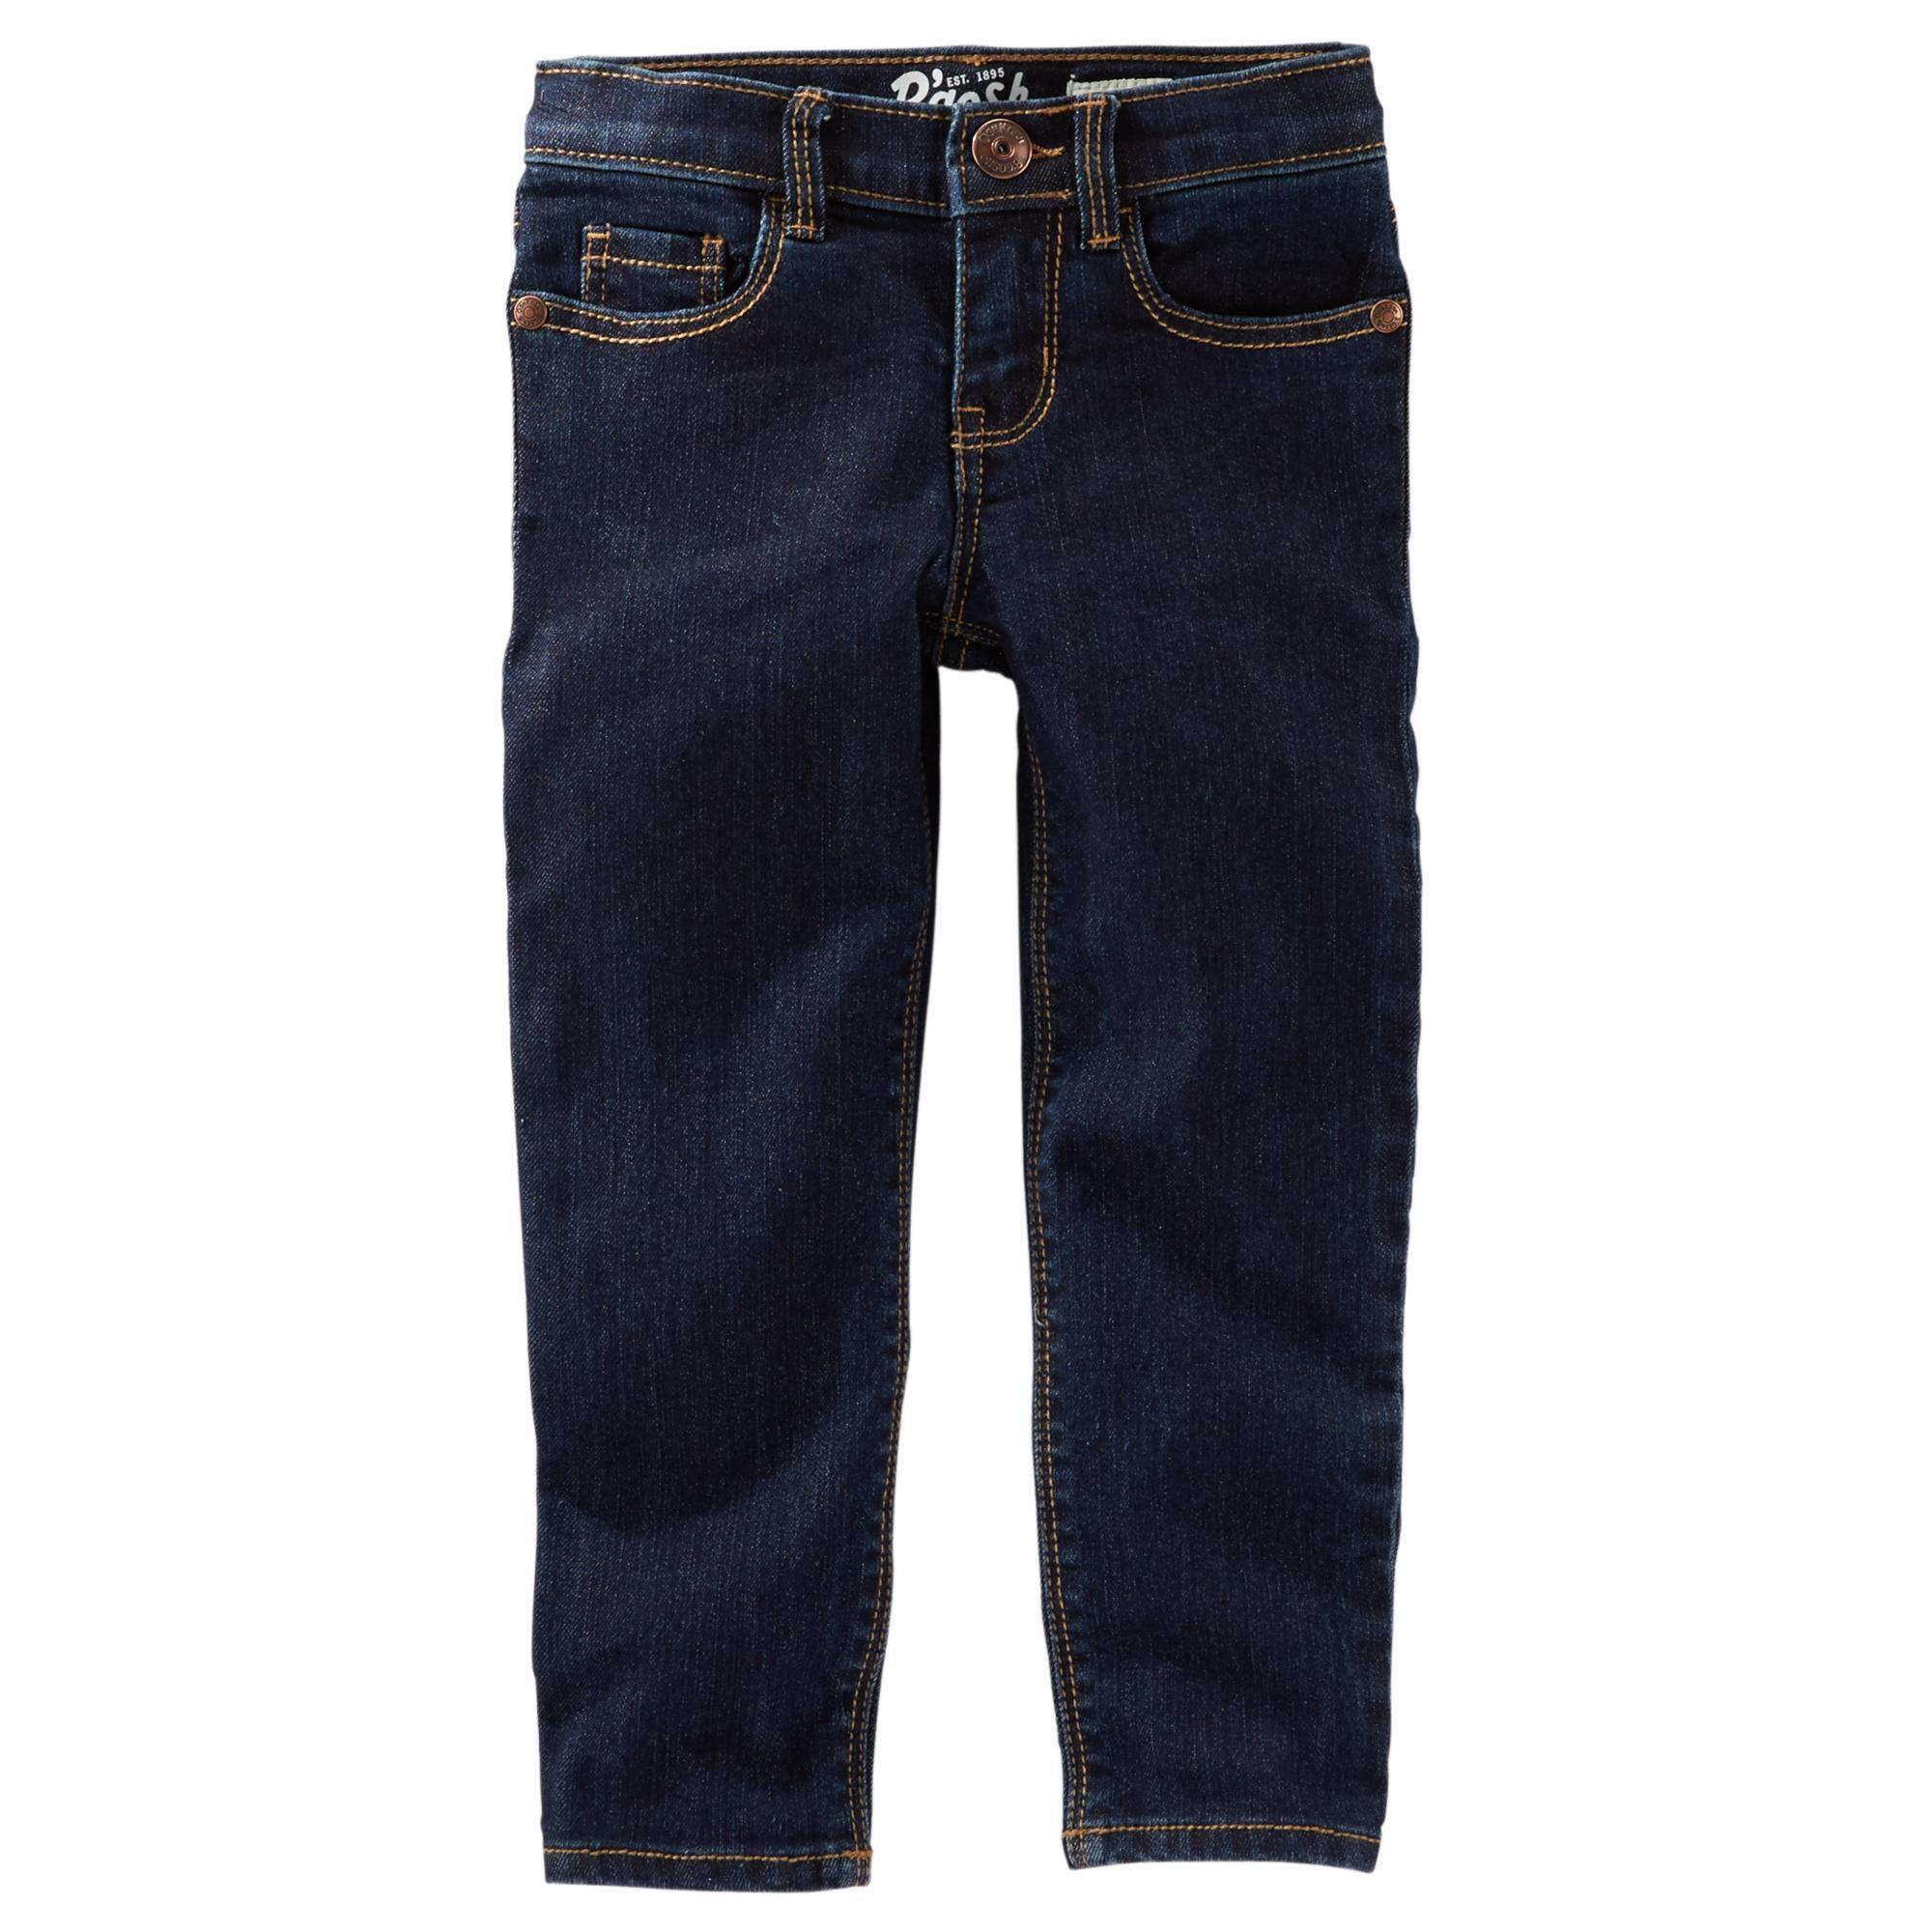 Super Skinny Jeans - Heritage Rinse | OshKosh.com